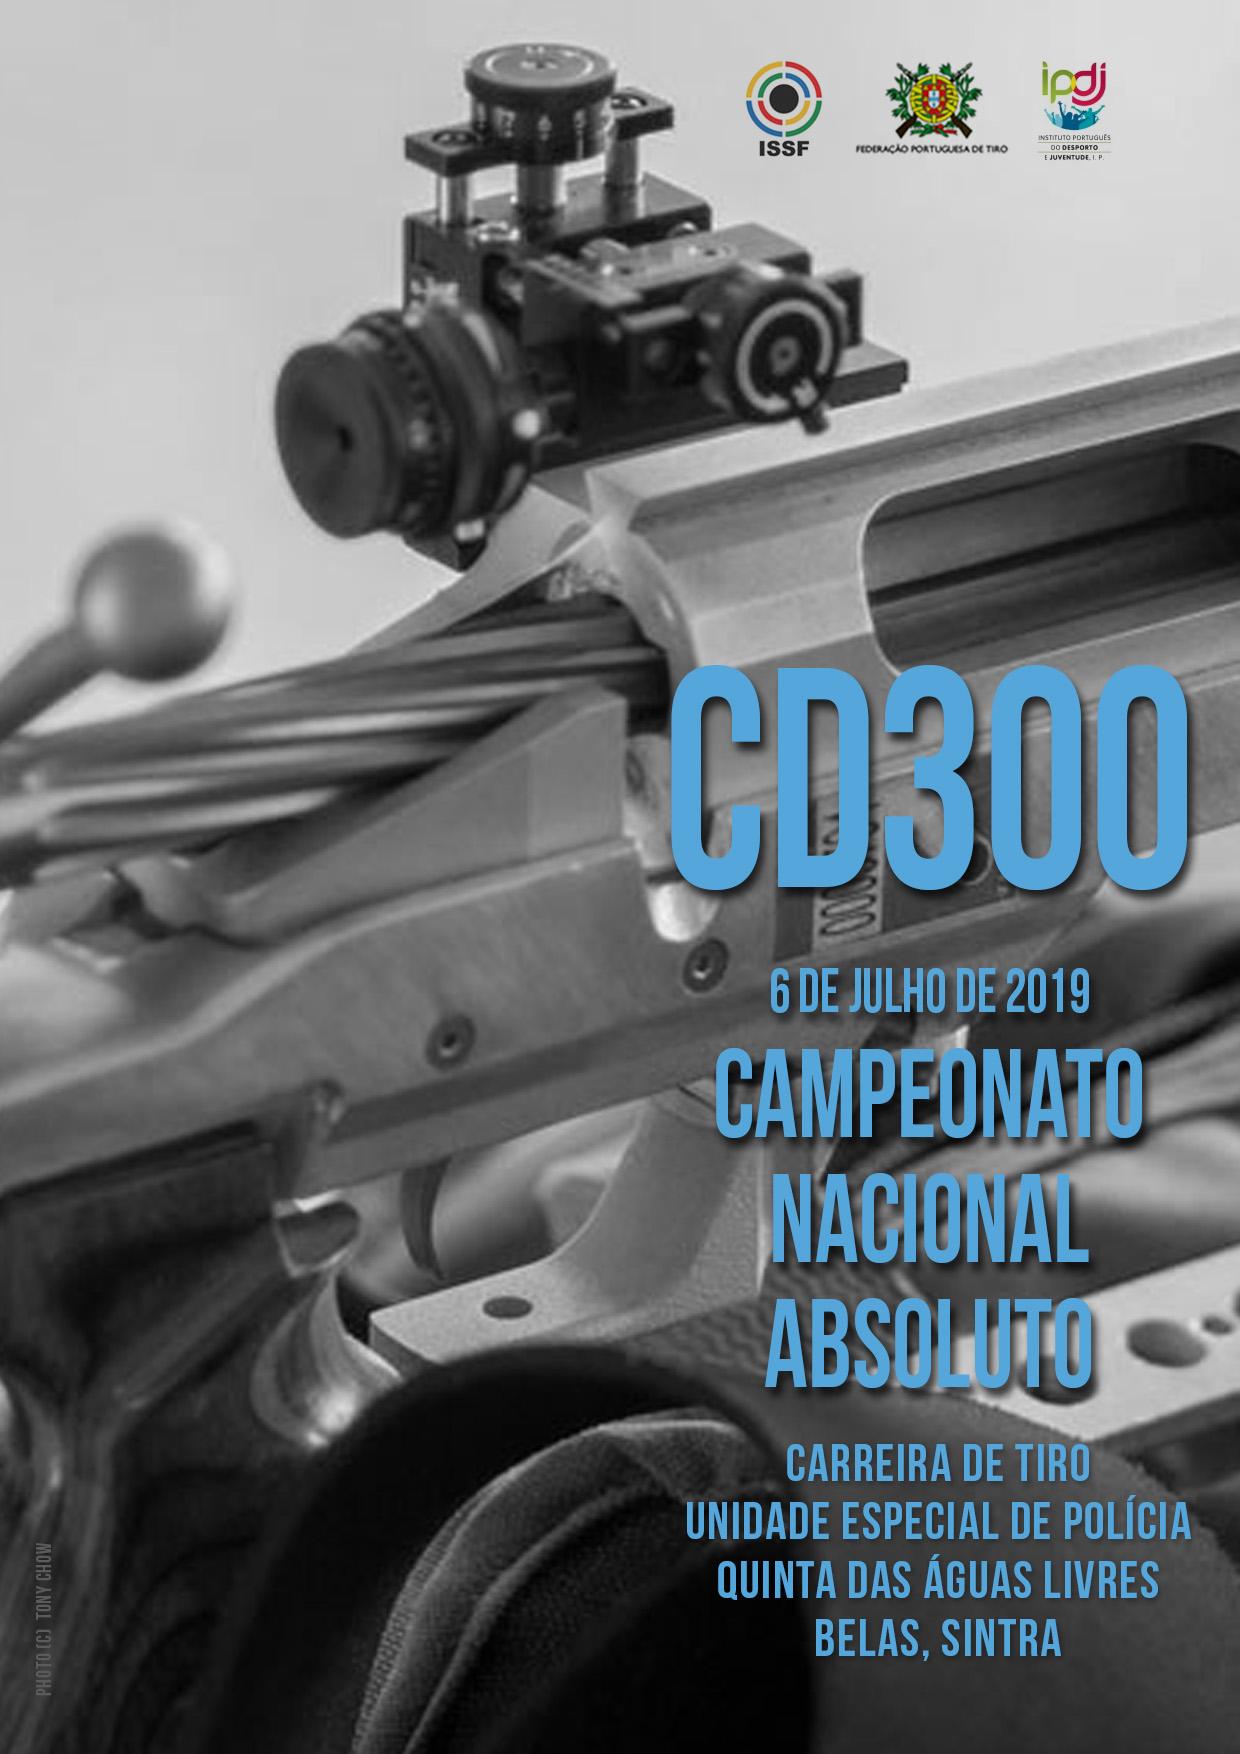 Campeonato Nacional C300 2019